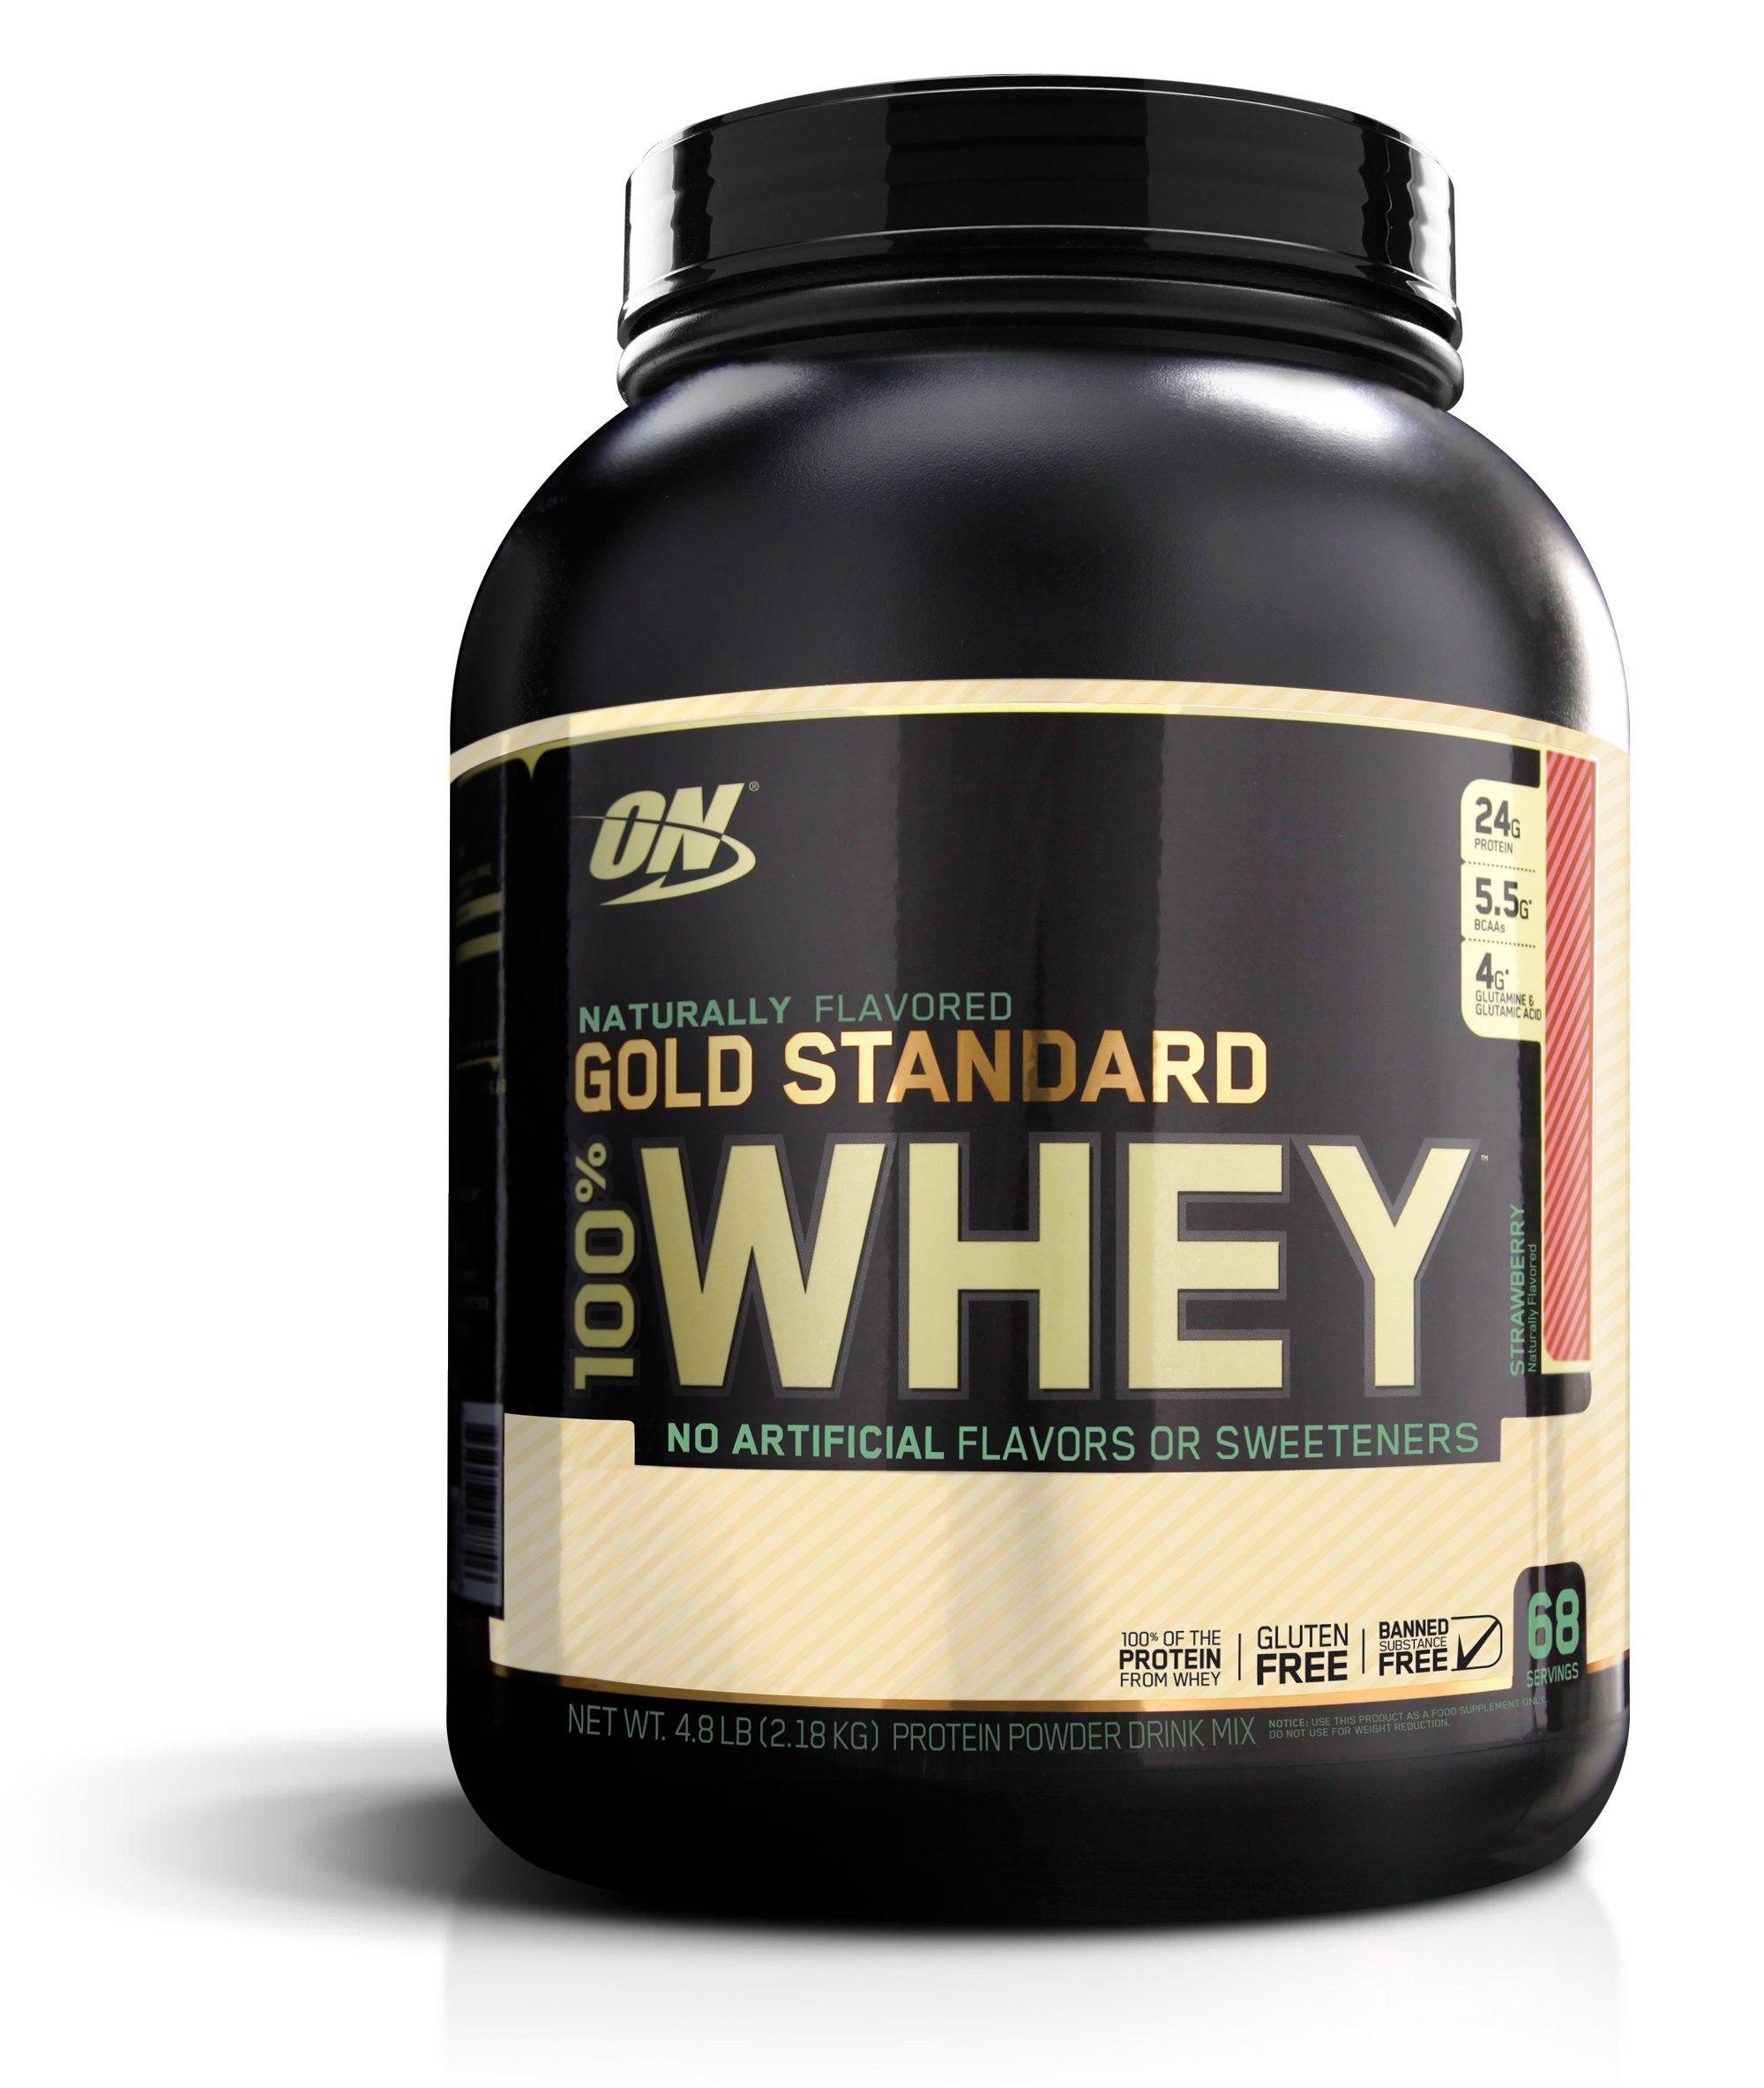 Optimum Nutrition Gold Standard 100% Whey Protein Powder, Naturally Flavored Strawberry, 4.8 Pound